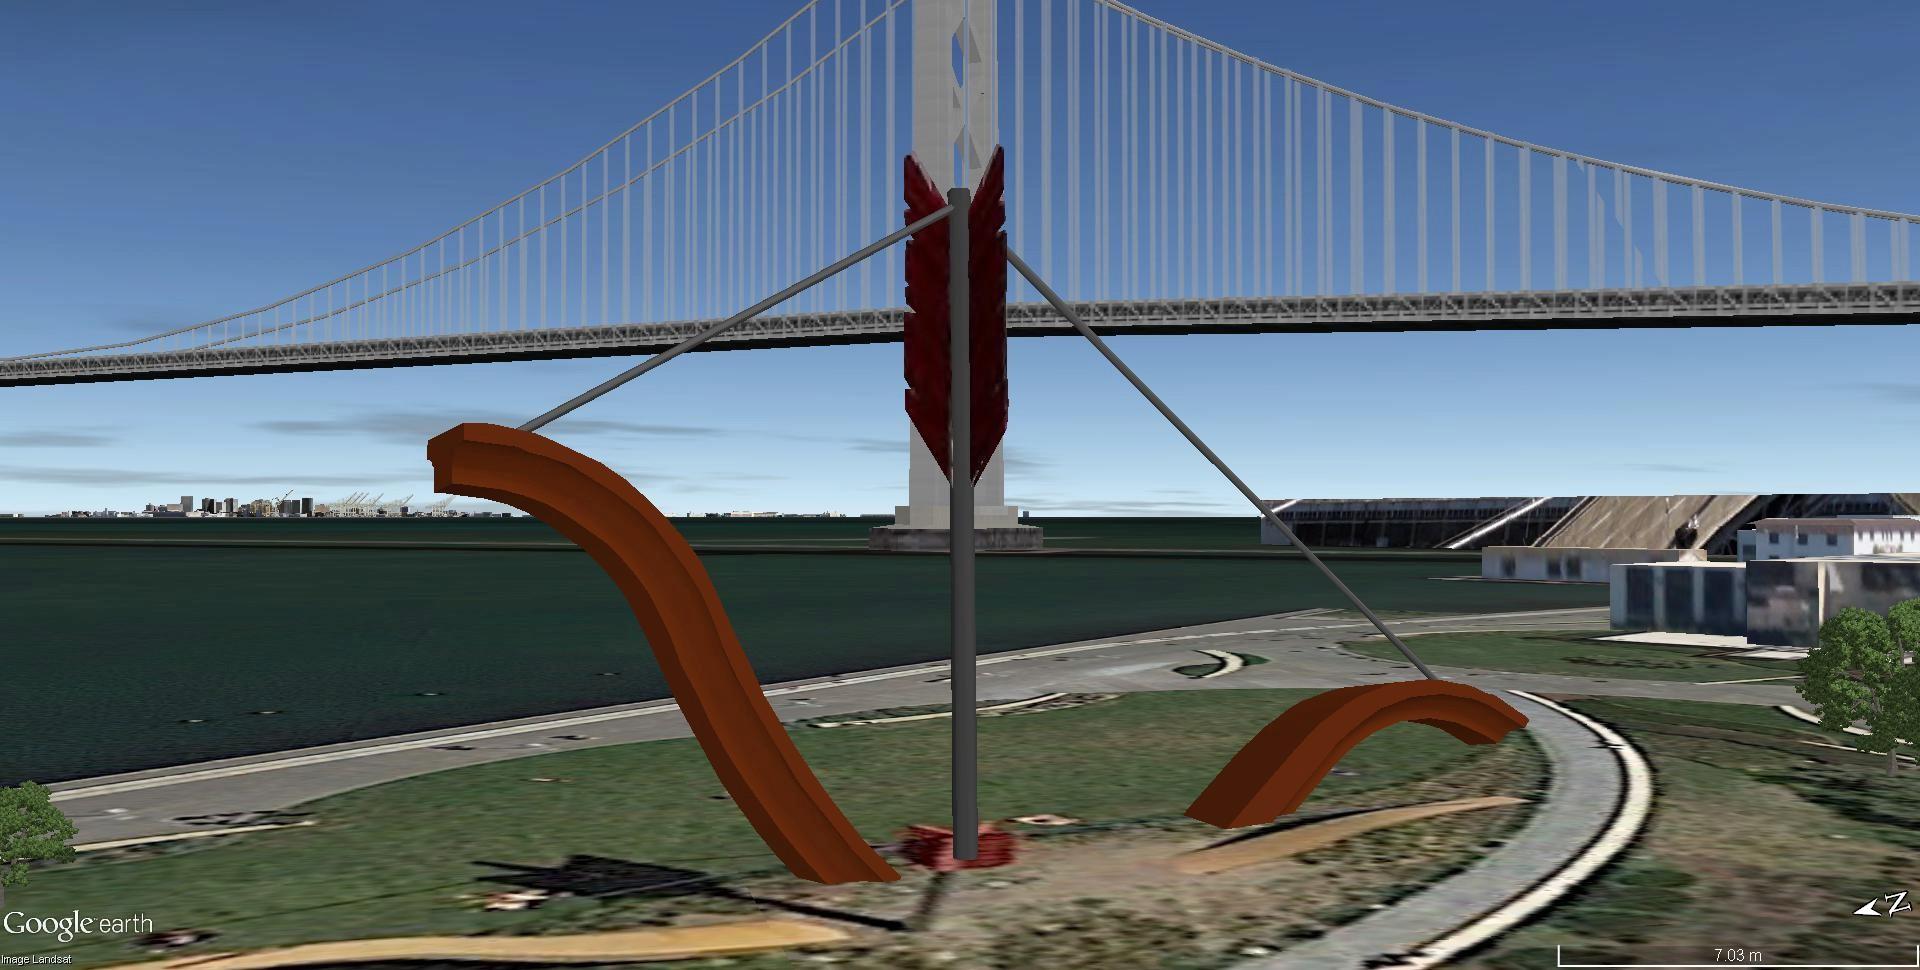 Arc géant (41m) à San Fransisco, Californie - USA Arc_vu10